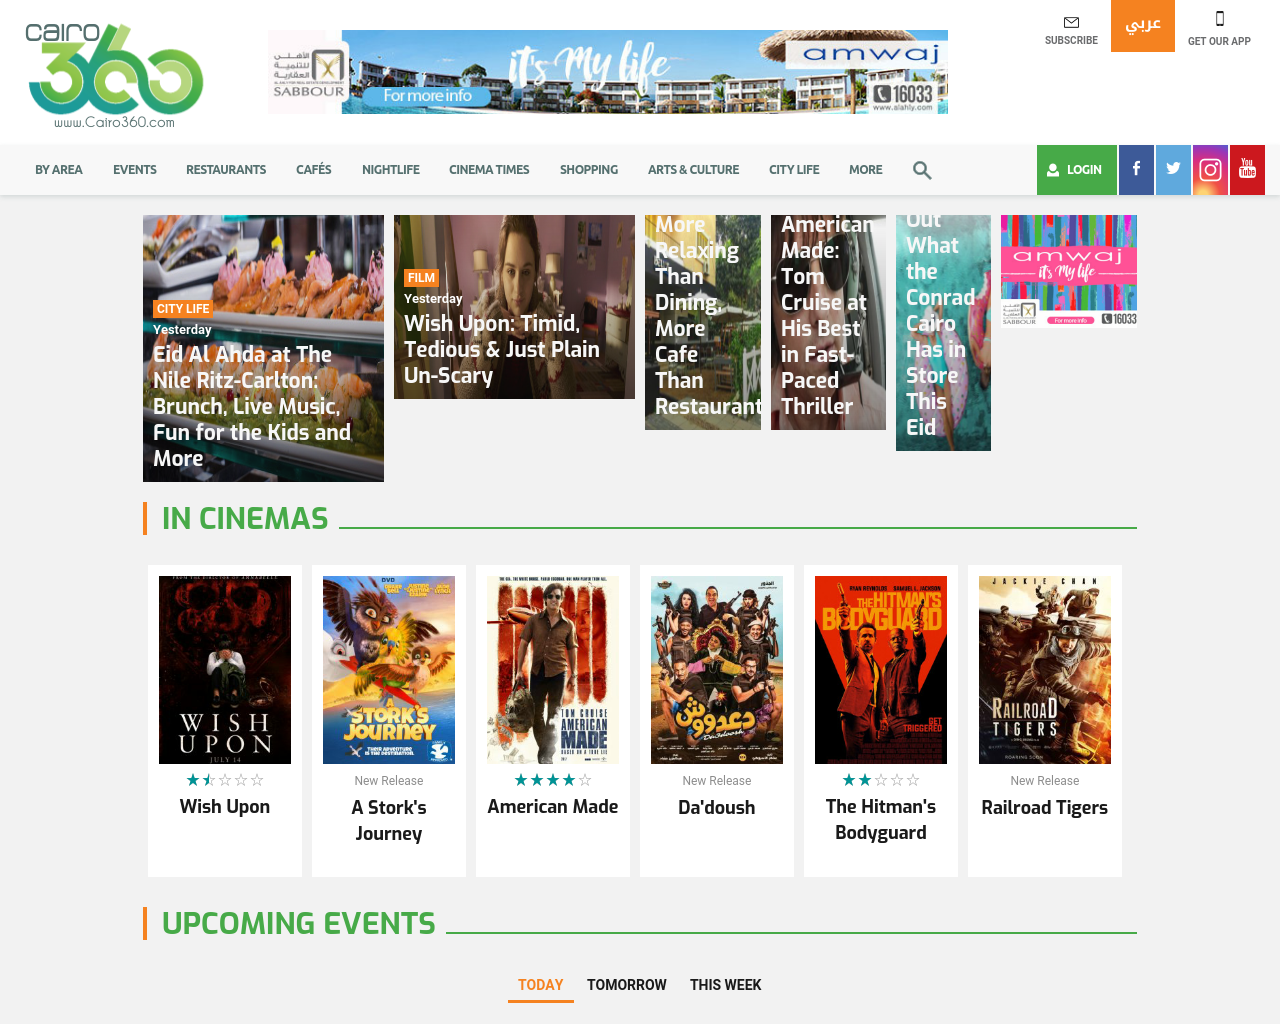 Cairo360-Advertising-Reviews-Pricing